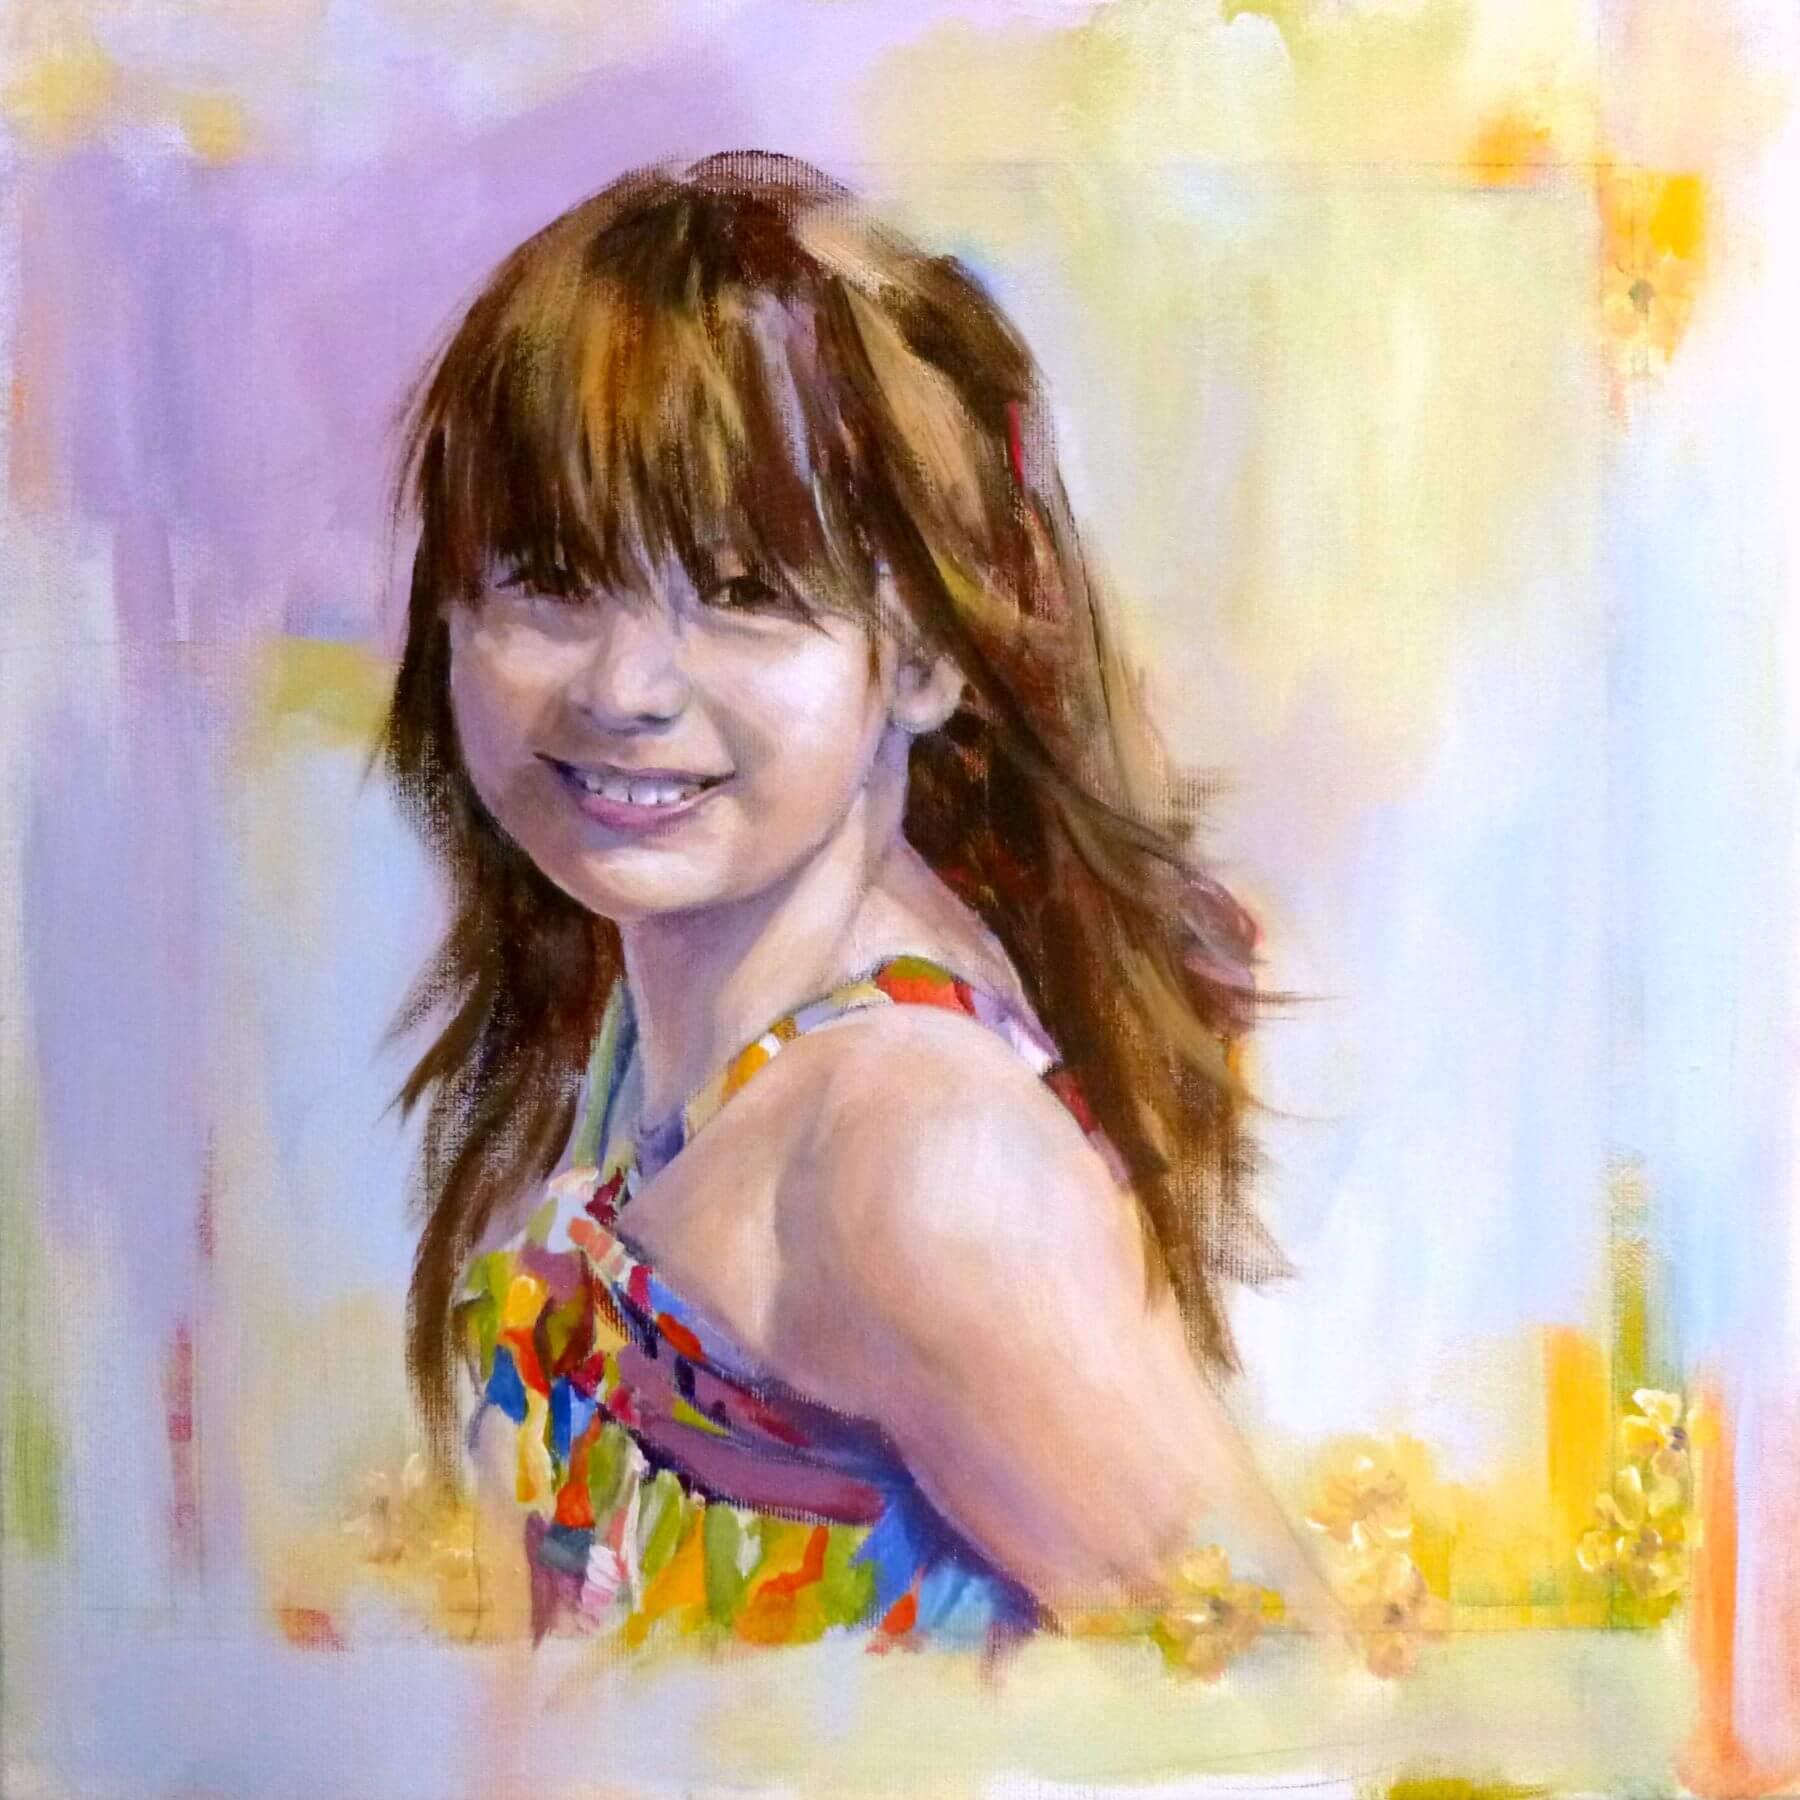 Monica, Painting. Acrylic on Canvas by Neva Bergemann, artist